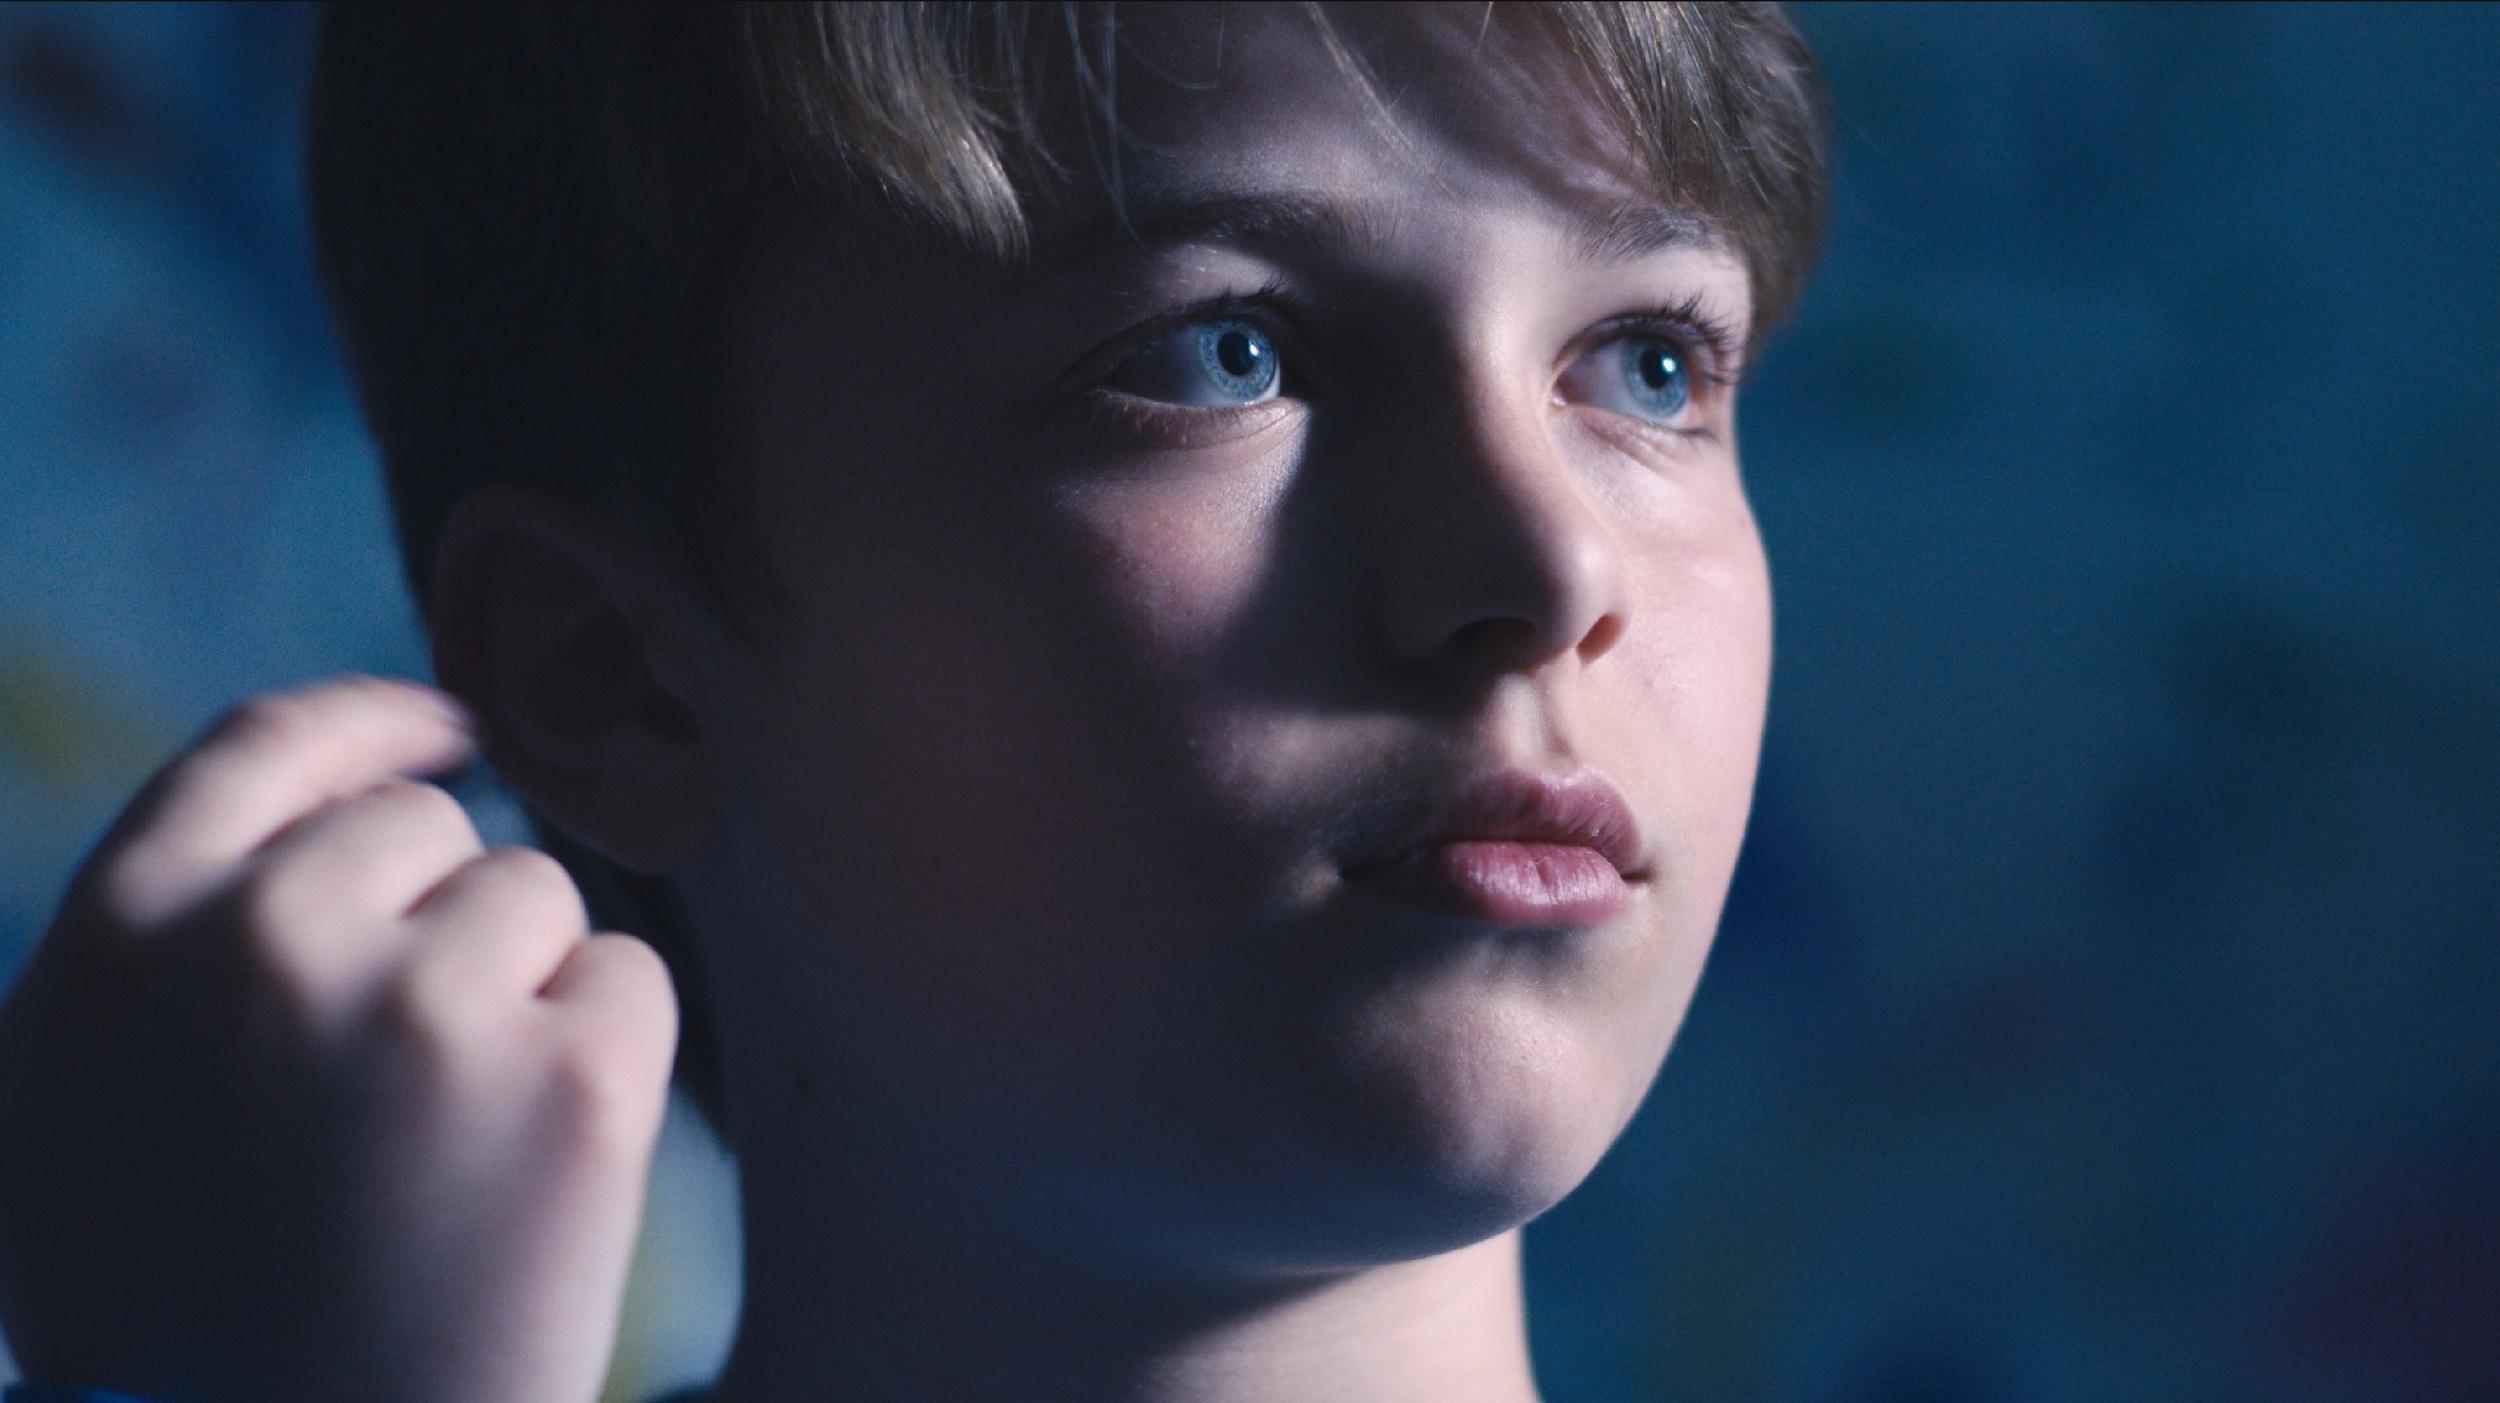 Jacob Hopkins as Adam, The boy who cried Fish.